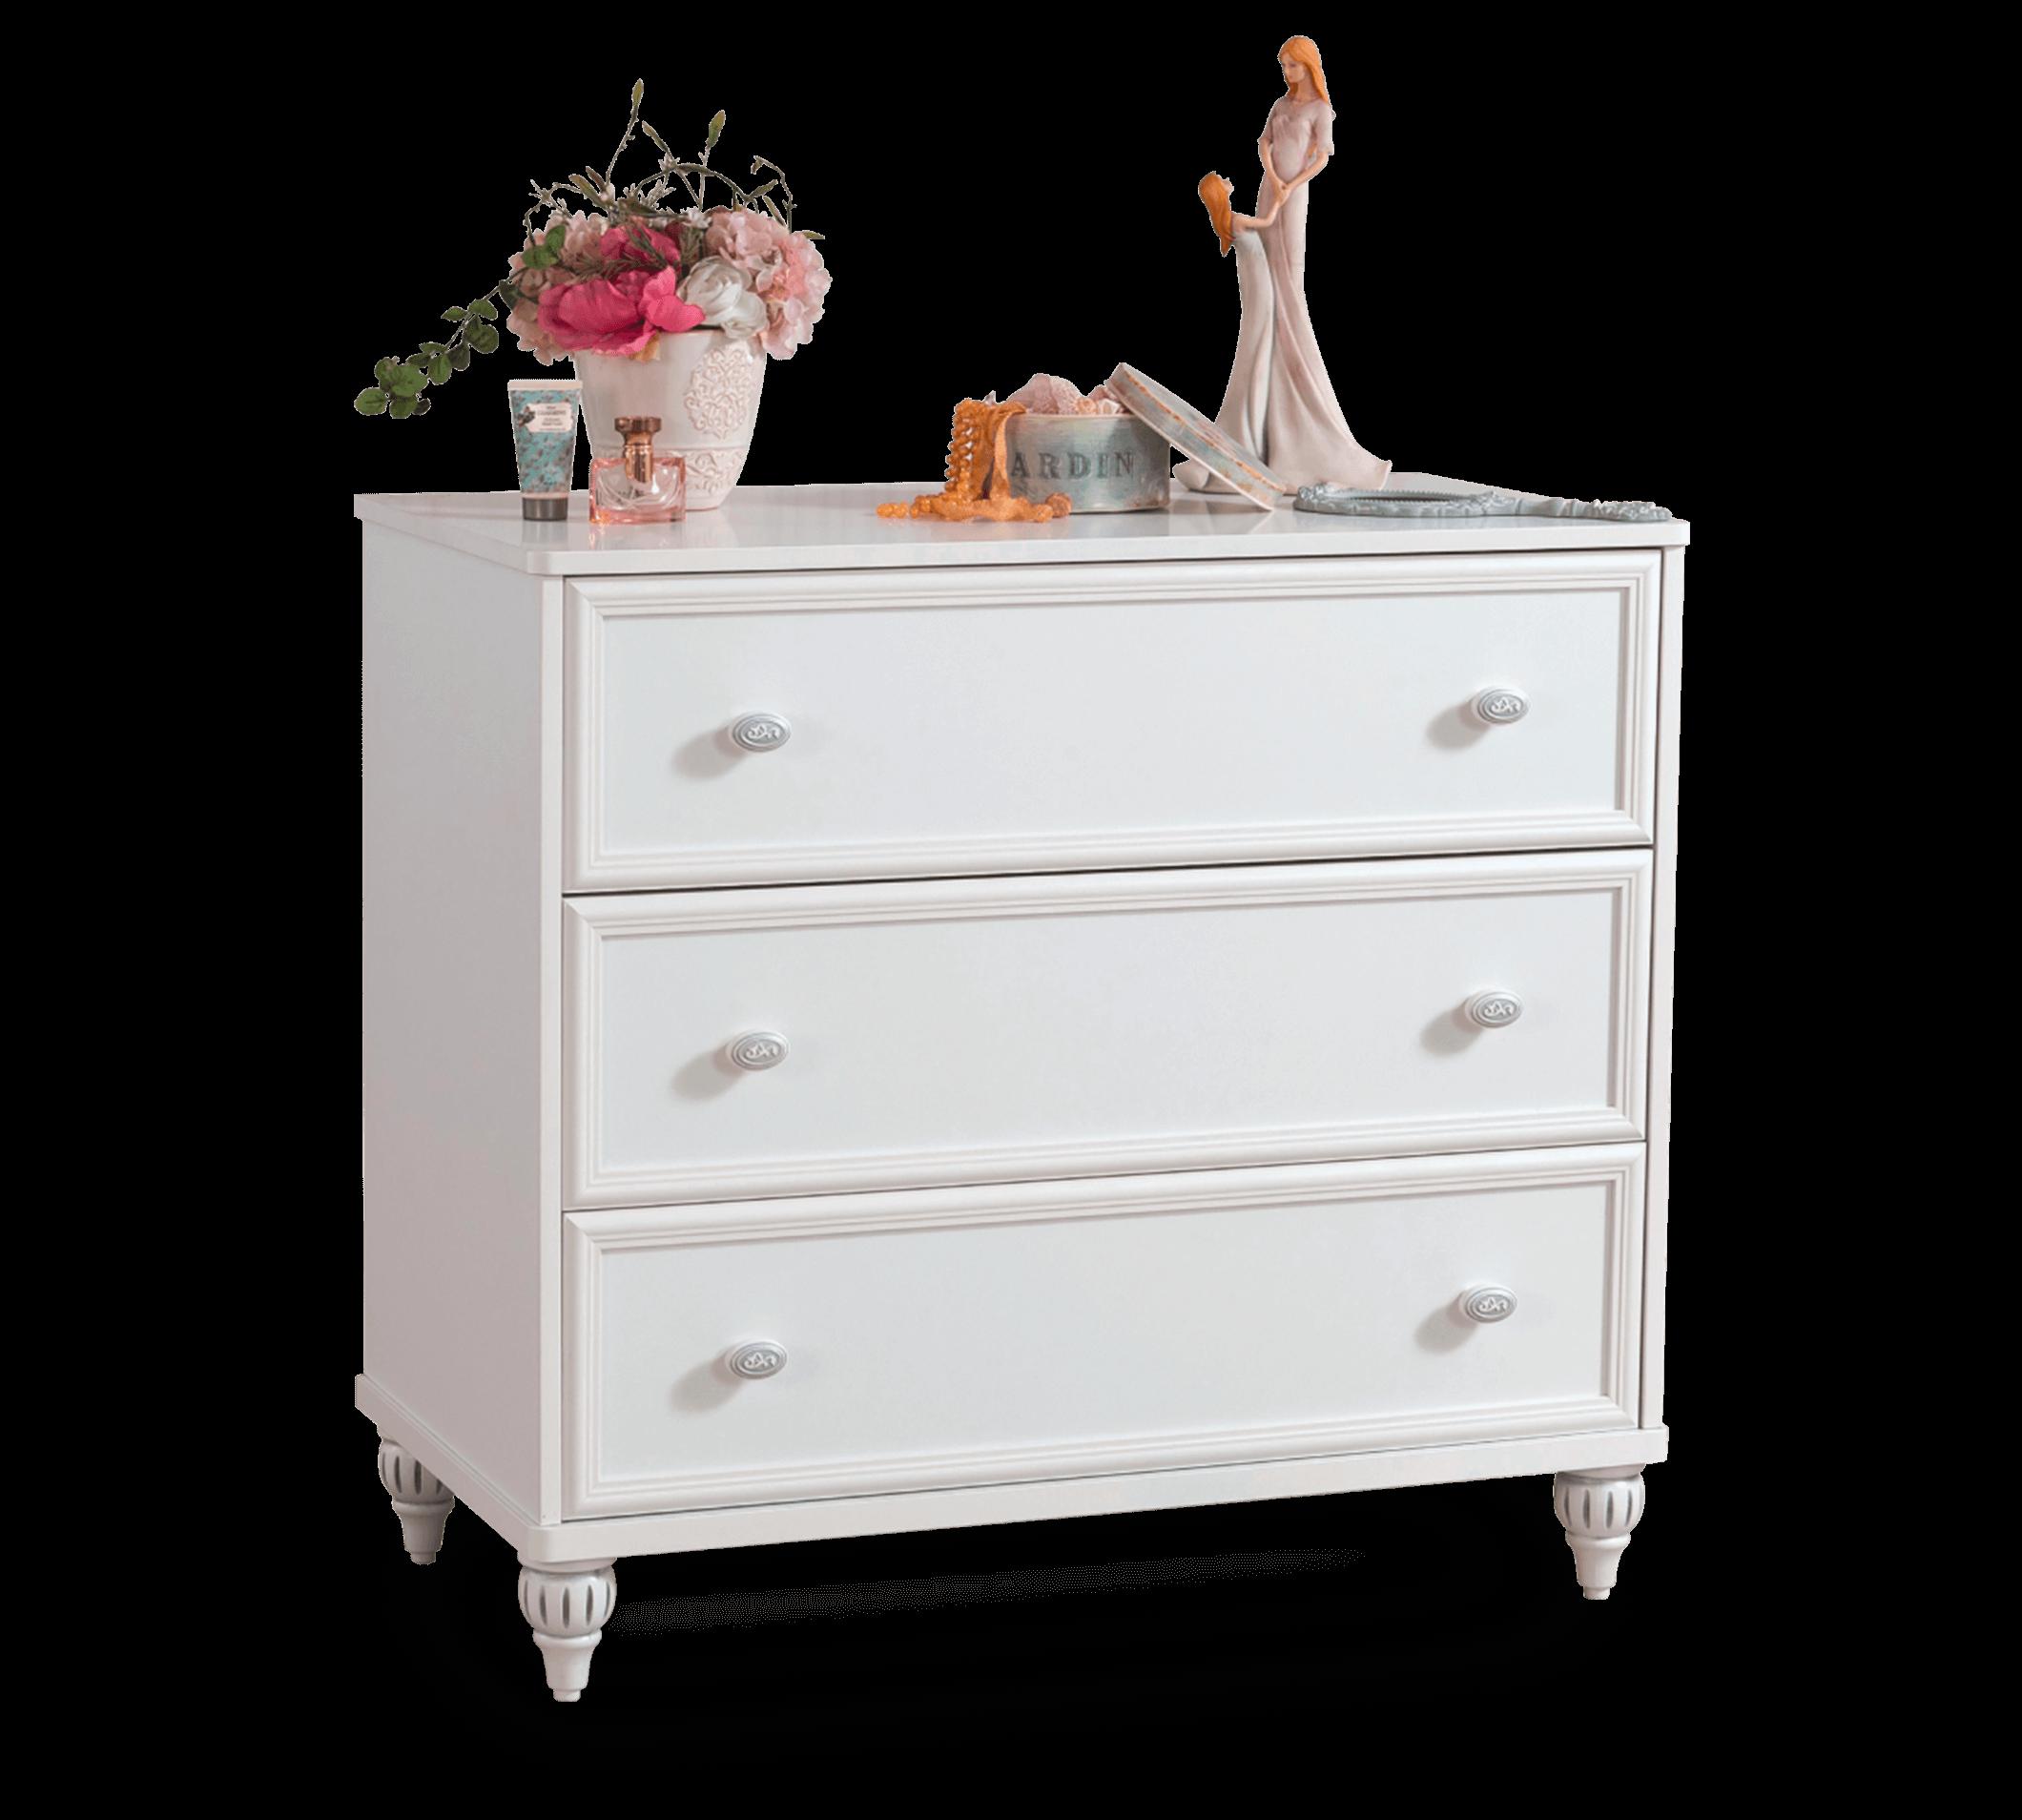 Comoda din pal cu 3 sertare, pentru copii si tineret Romantica White, l90xA50xH84 cm imagine